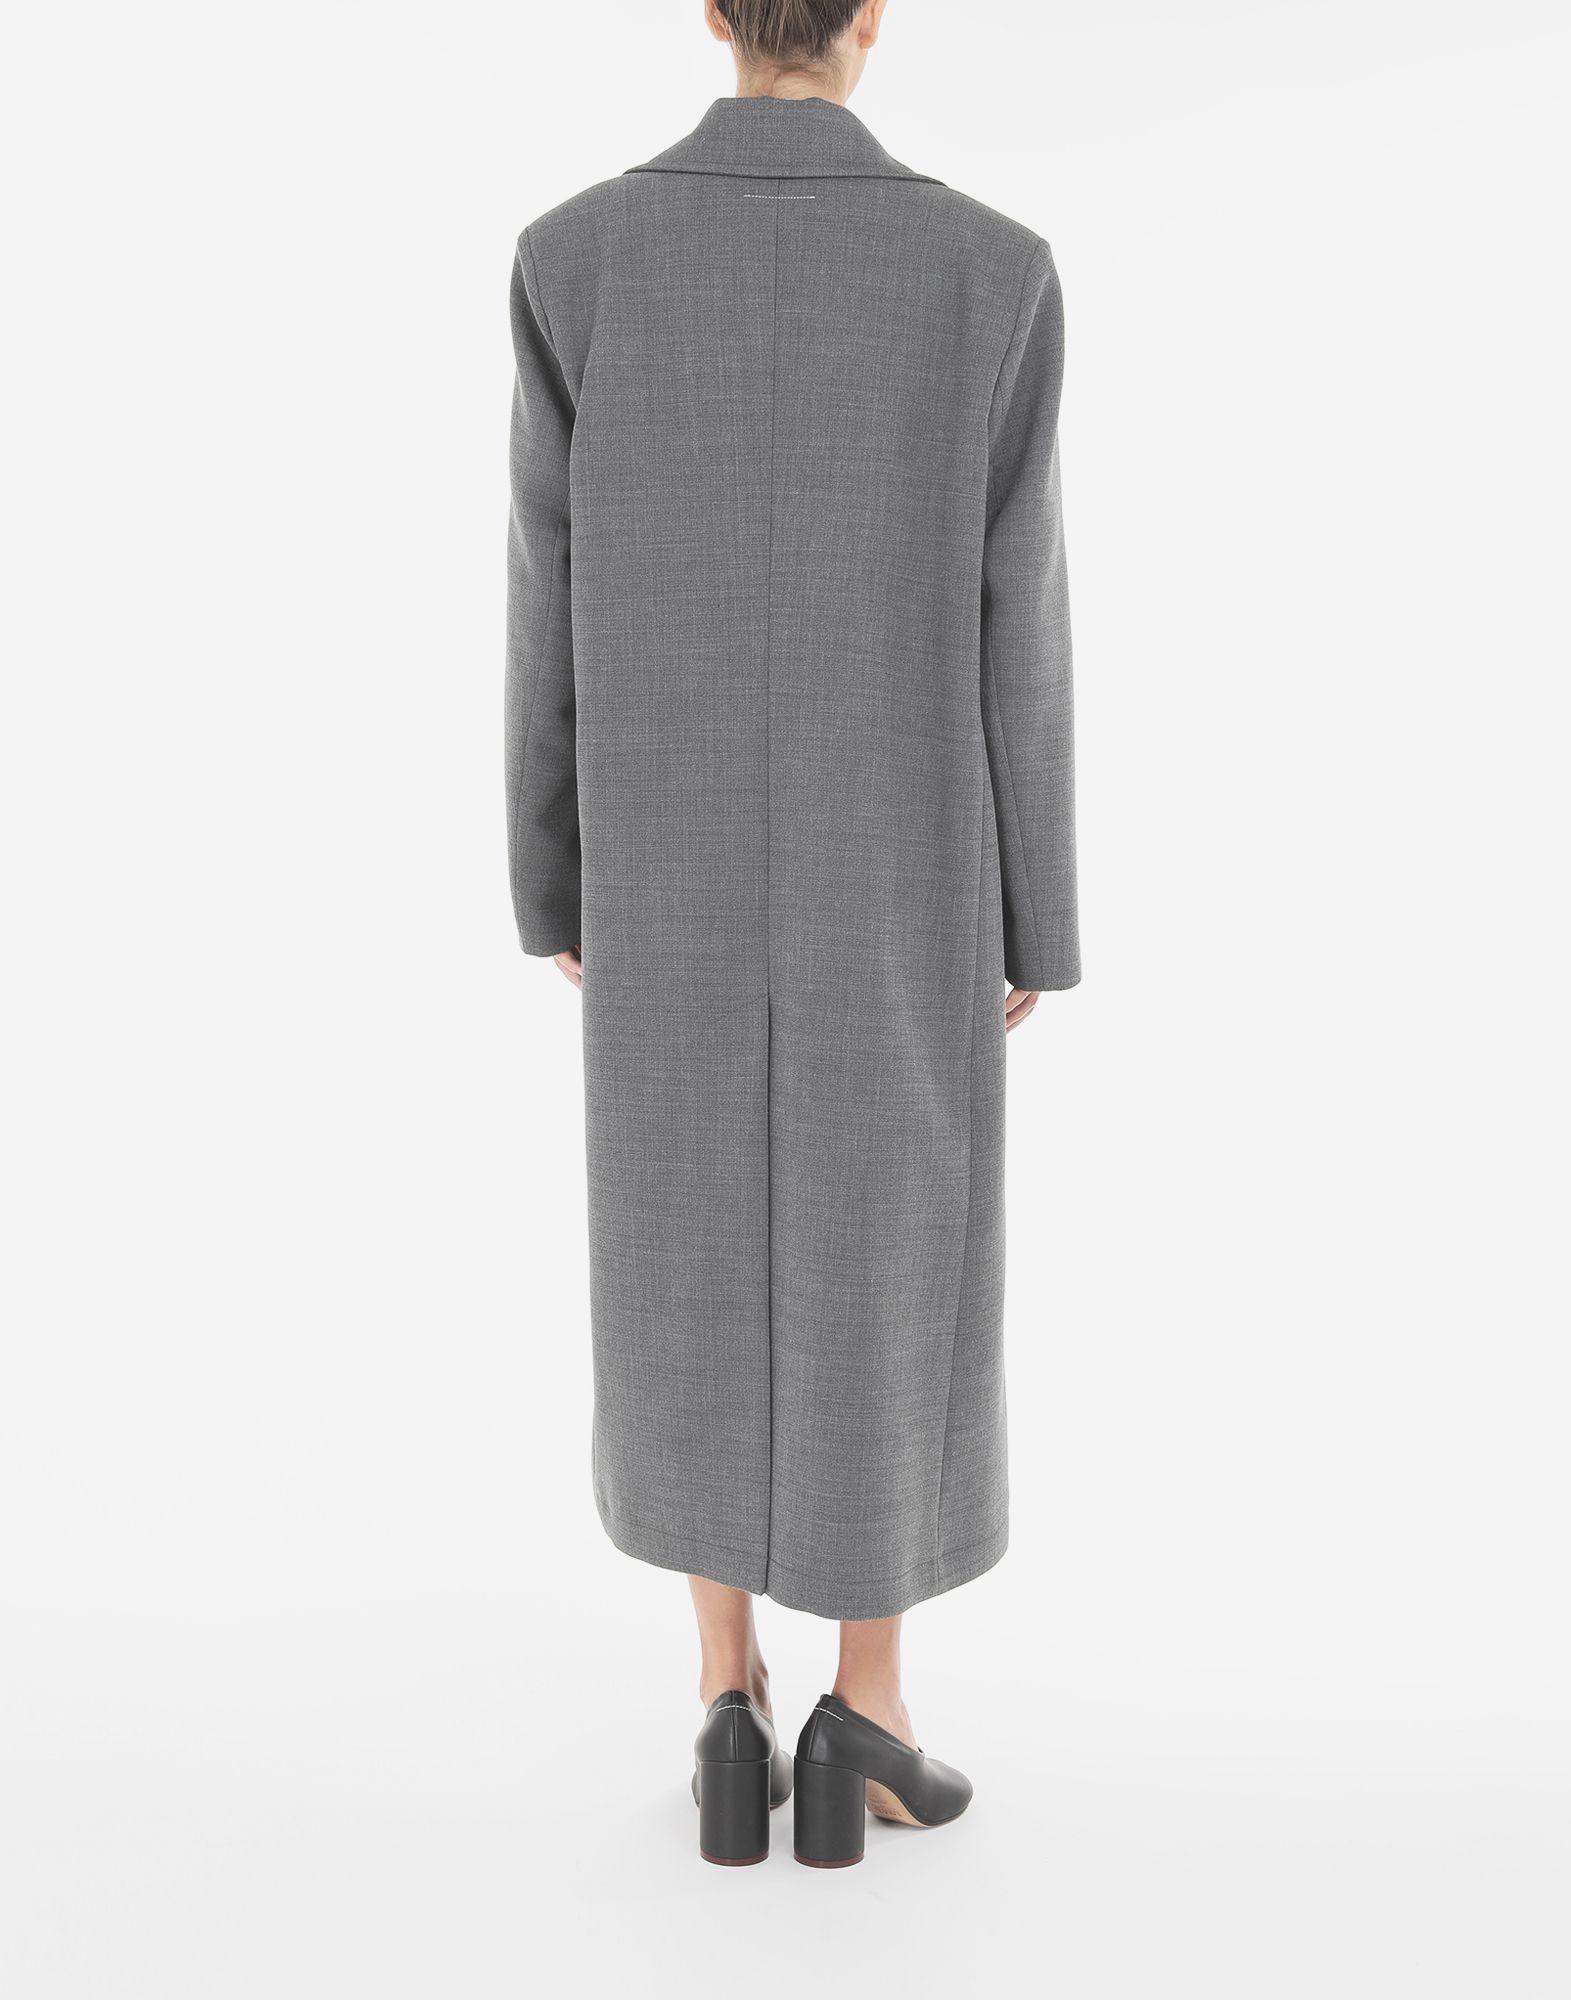 MM6 MAISON MARGIELA Techno-wool coat Coats and Trenches Woman e